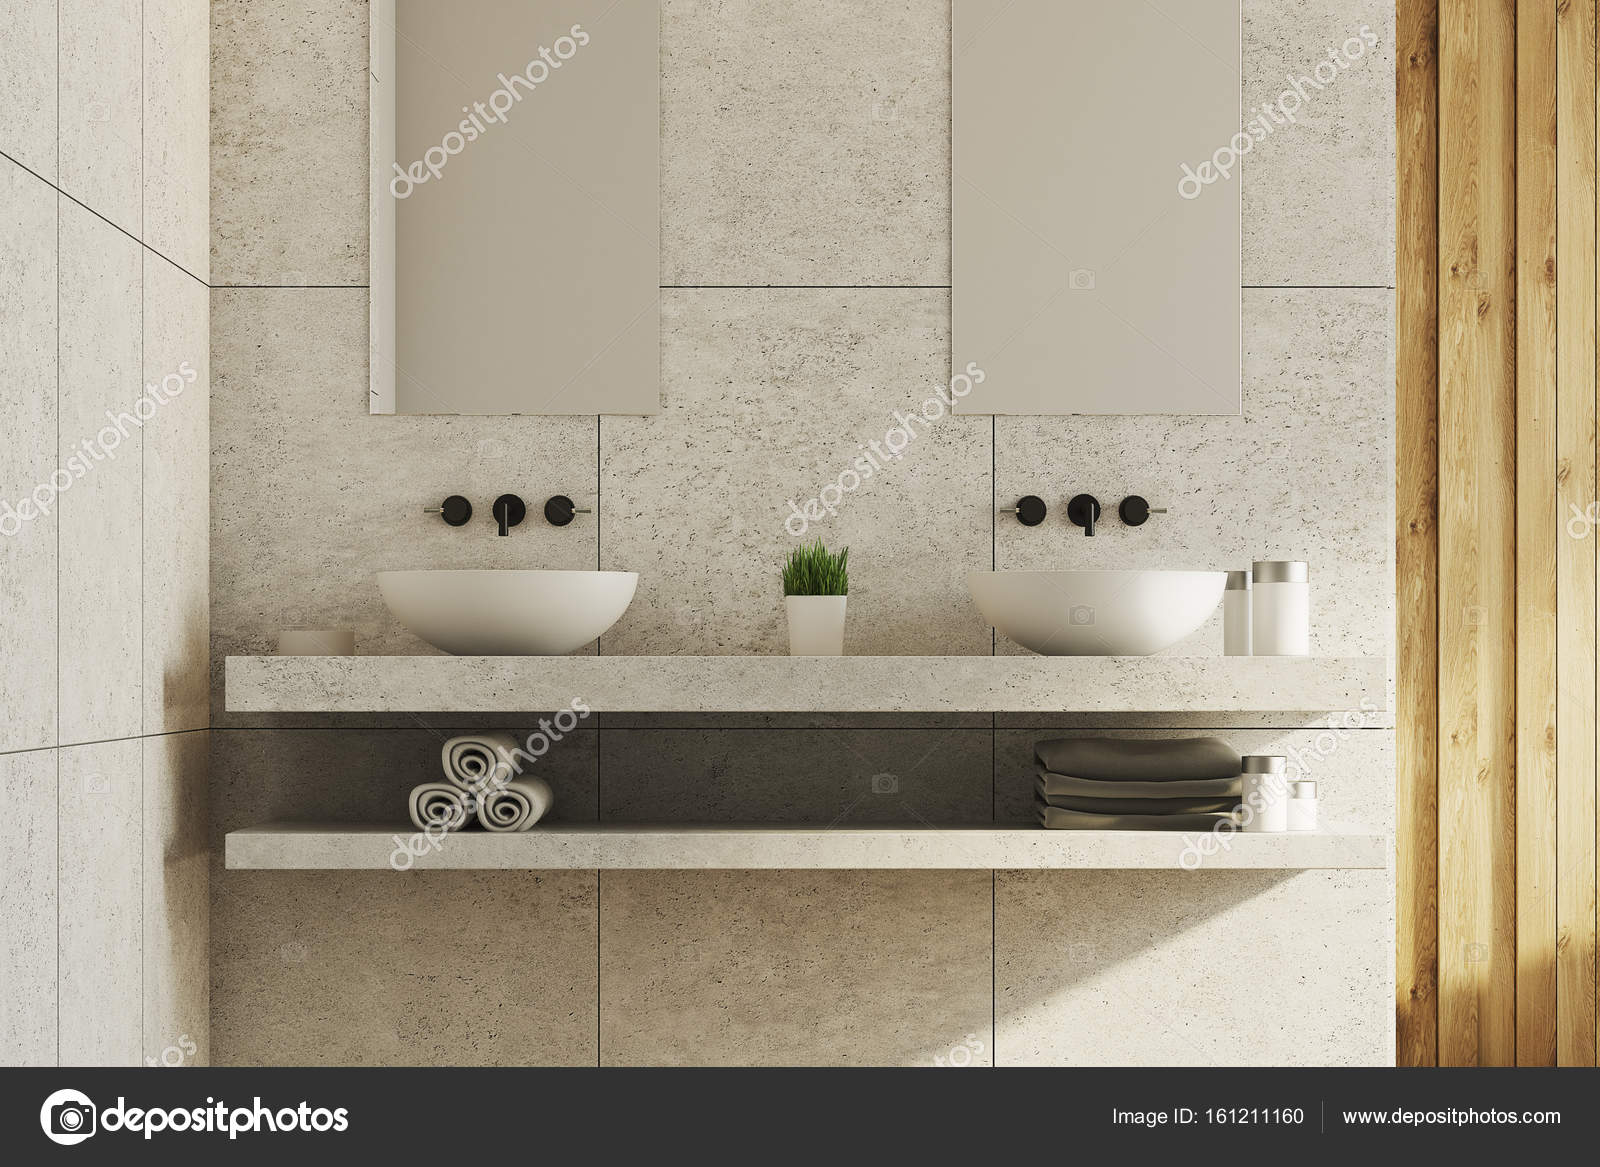 https://st3.depositphotos.com/2673929/16121/i/1600/depositphotos_161211160-stockafbeelding-marmer-en-houten-badkamer-putten.jpg